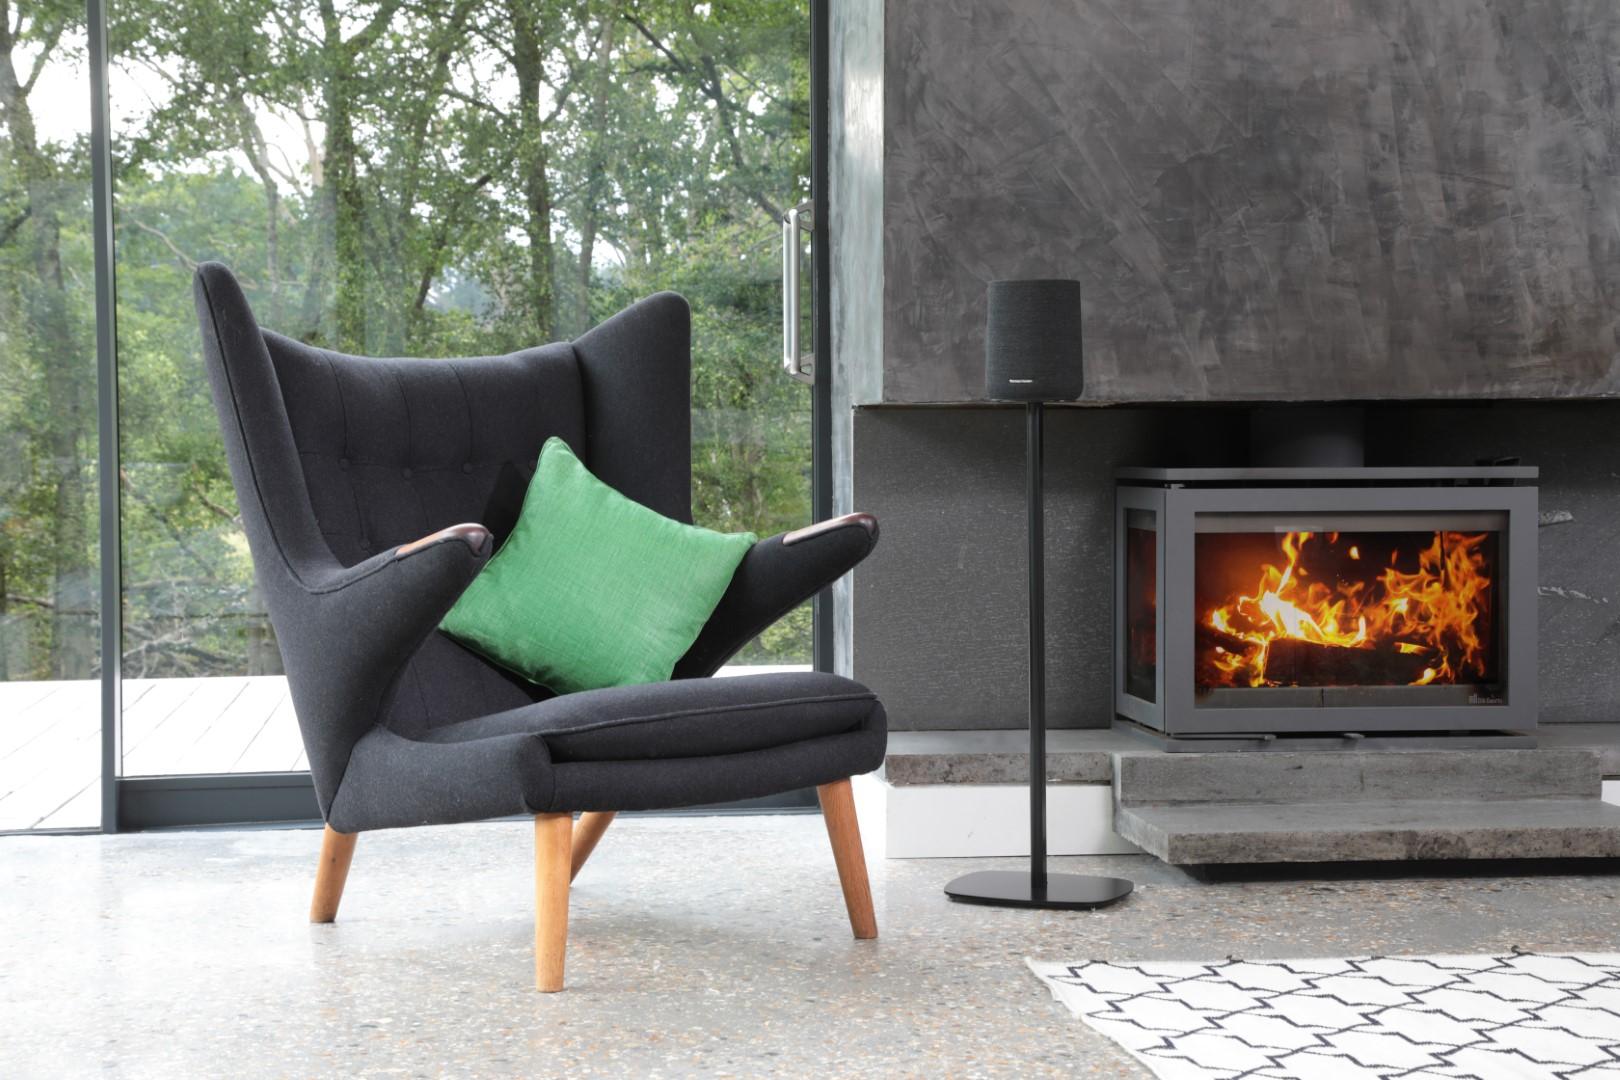 chair-fireplace-CTONE-FS-black-Gross